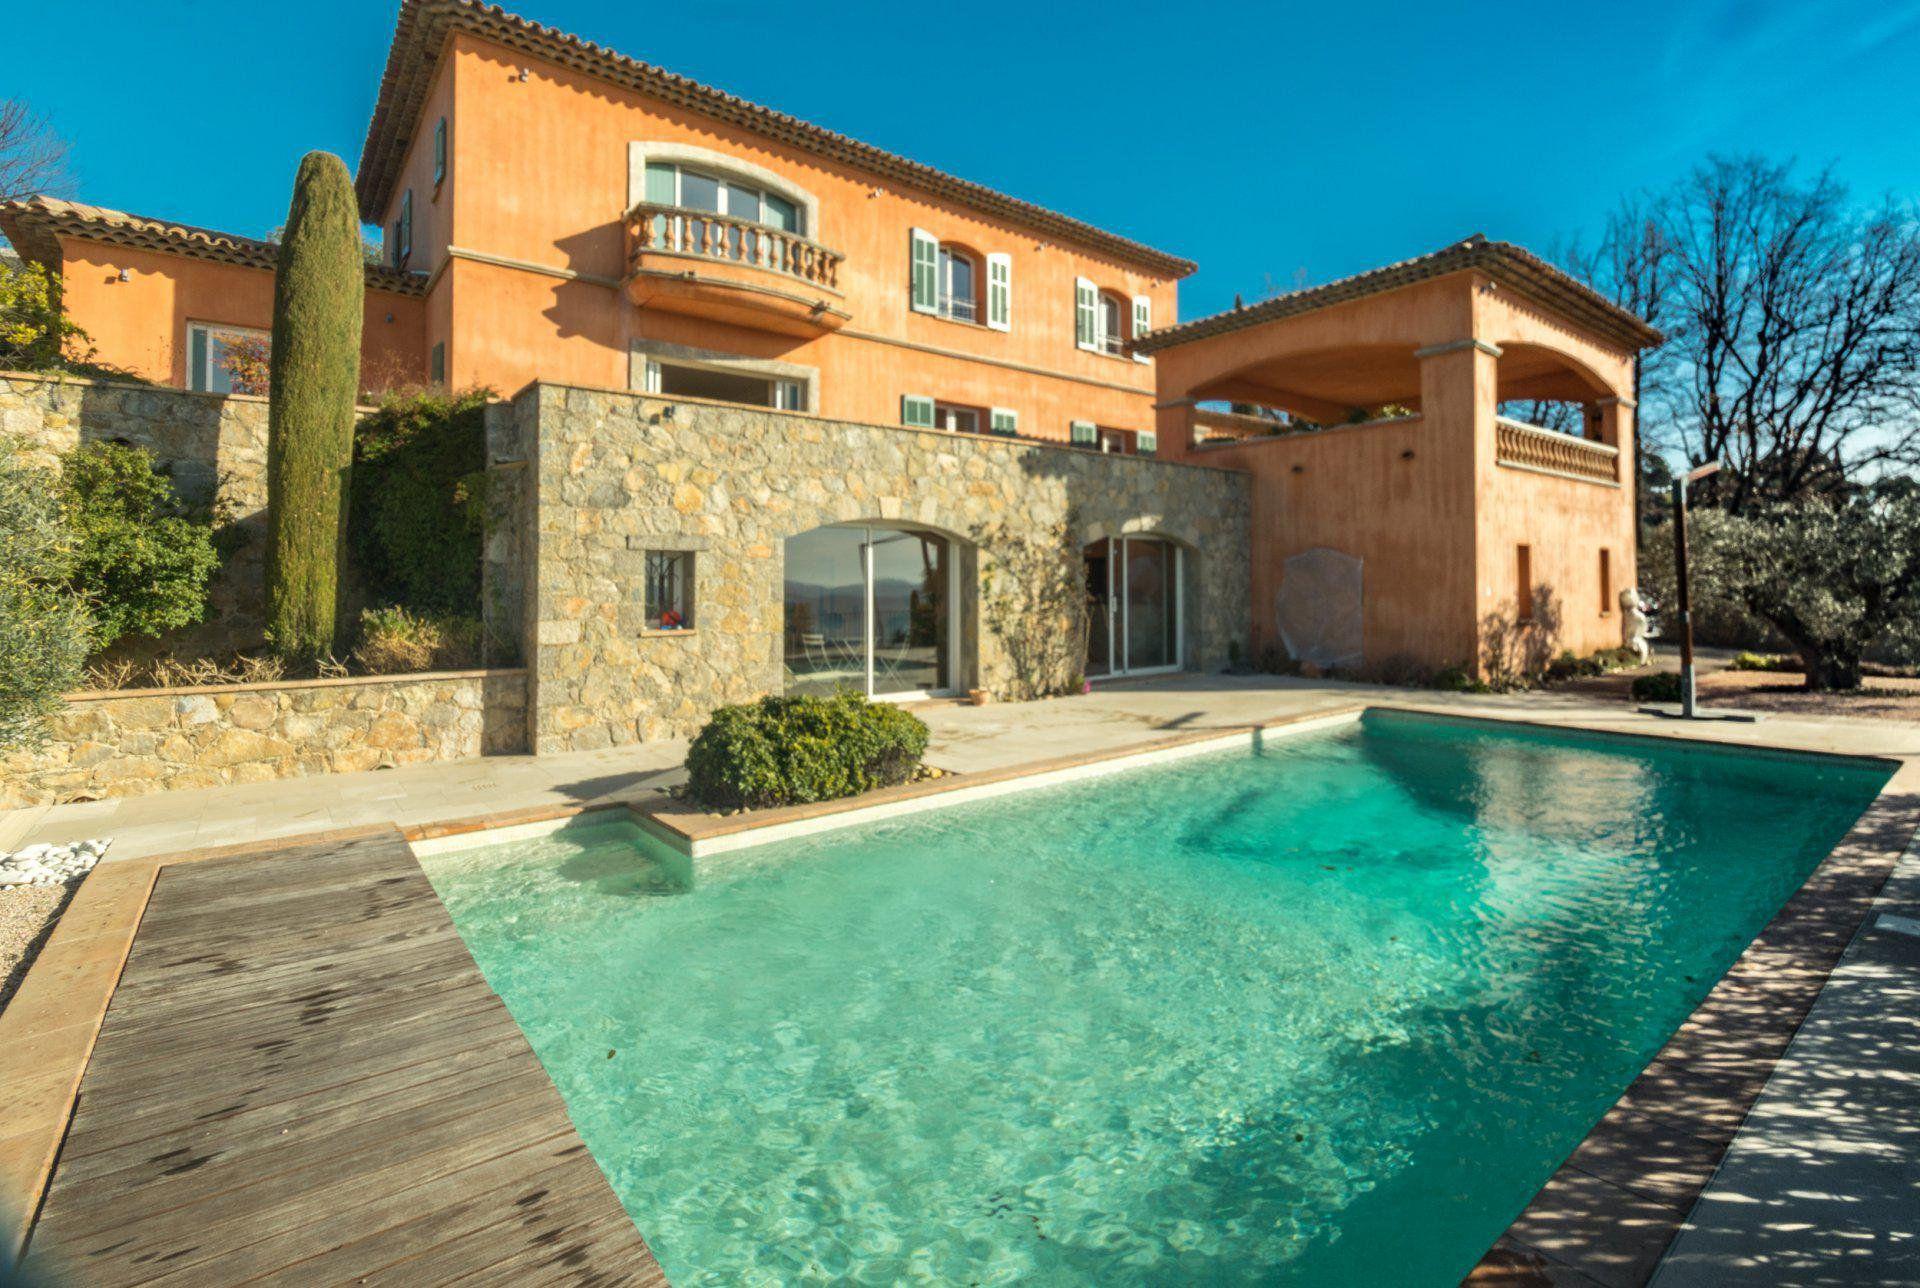 Виза и ВНЖ при покупке недвижимости во Франции